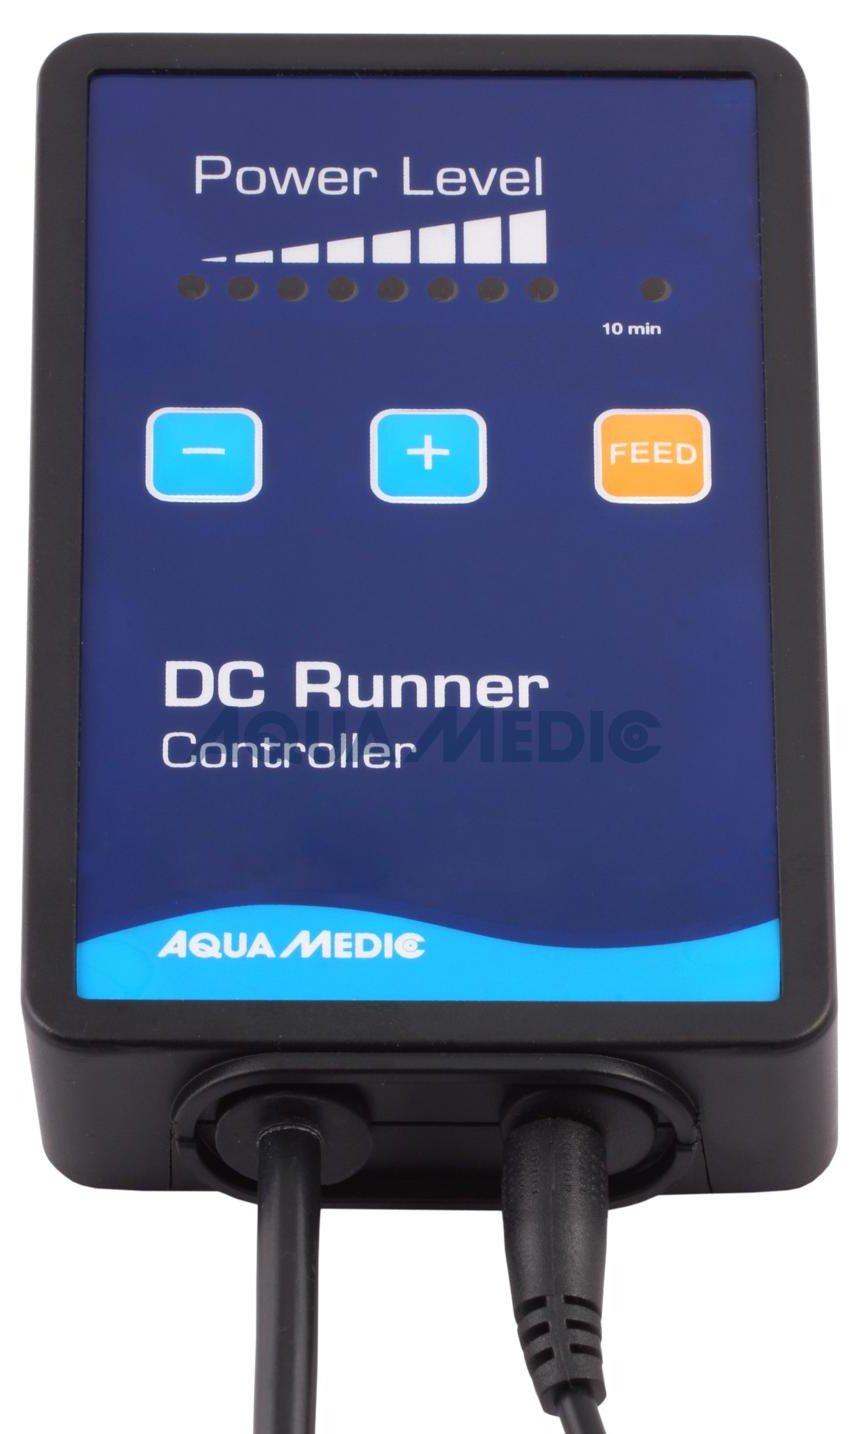 Shop Aqua Medic External Protein Skimmer EVO 3000